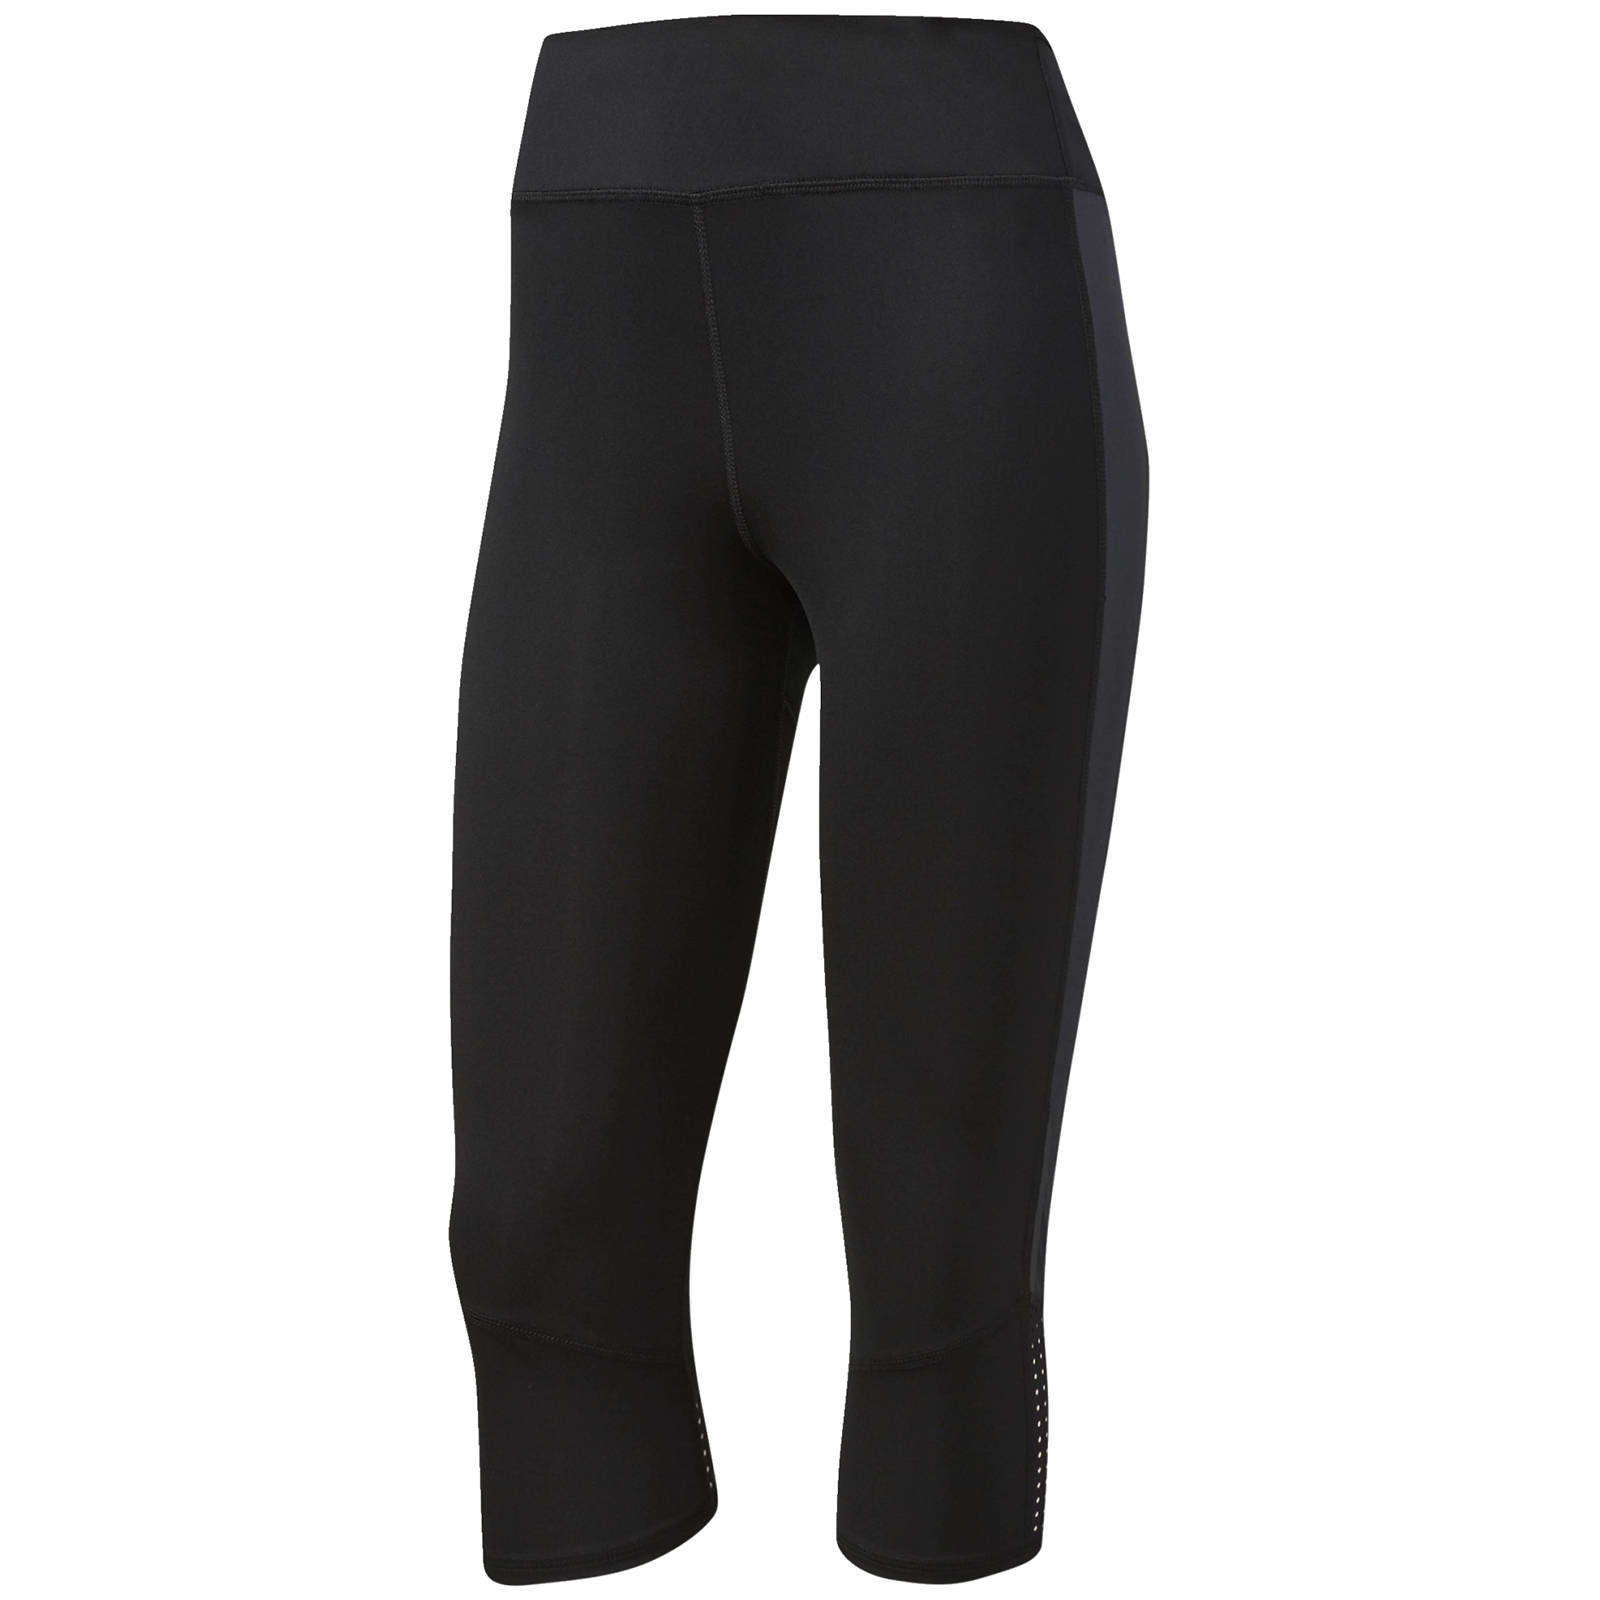 ed947809c6a adidas Women's Supernova 3/4 Running Tights - Black   ProBikeKit.com